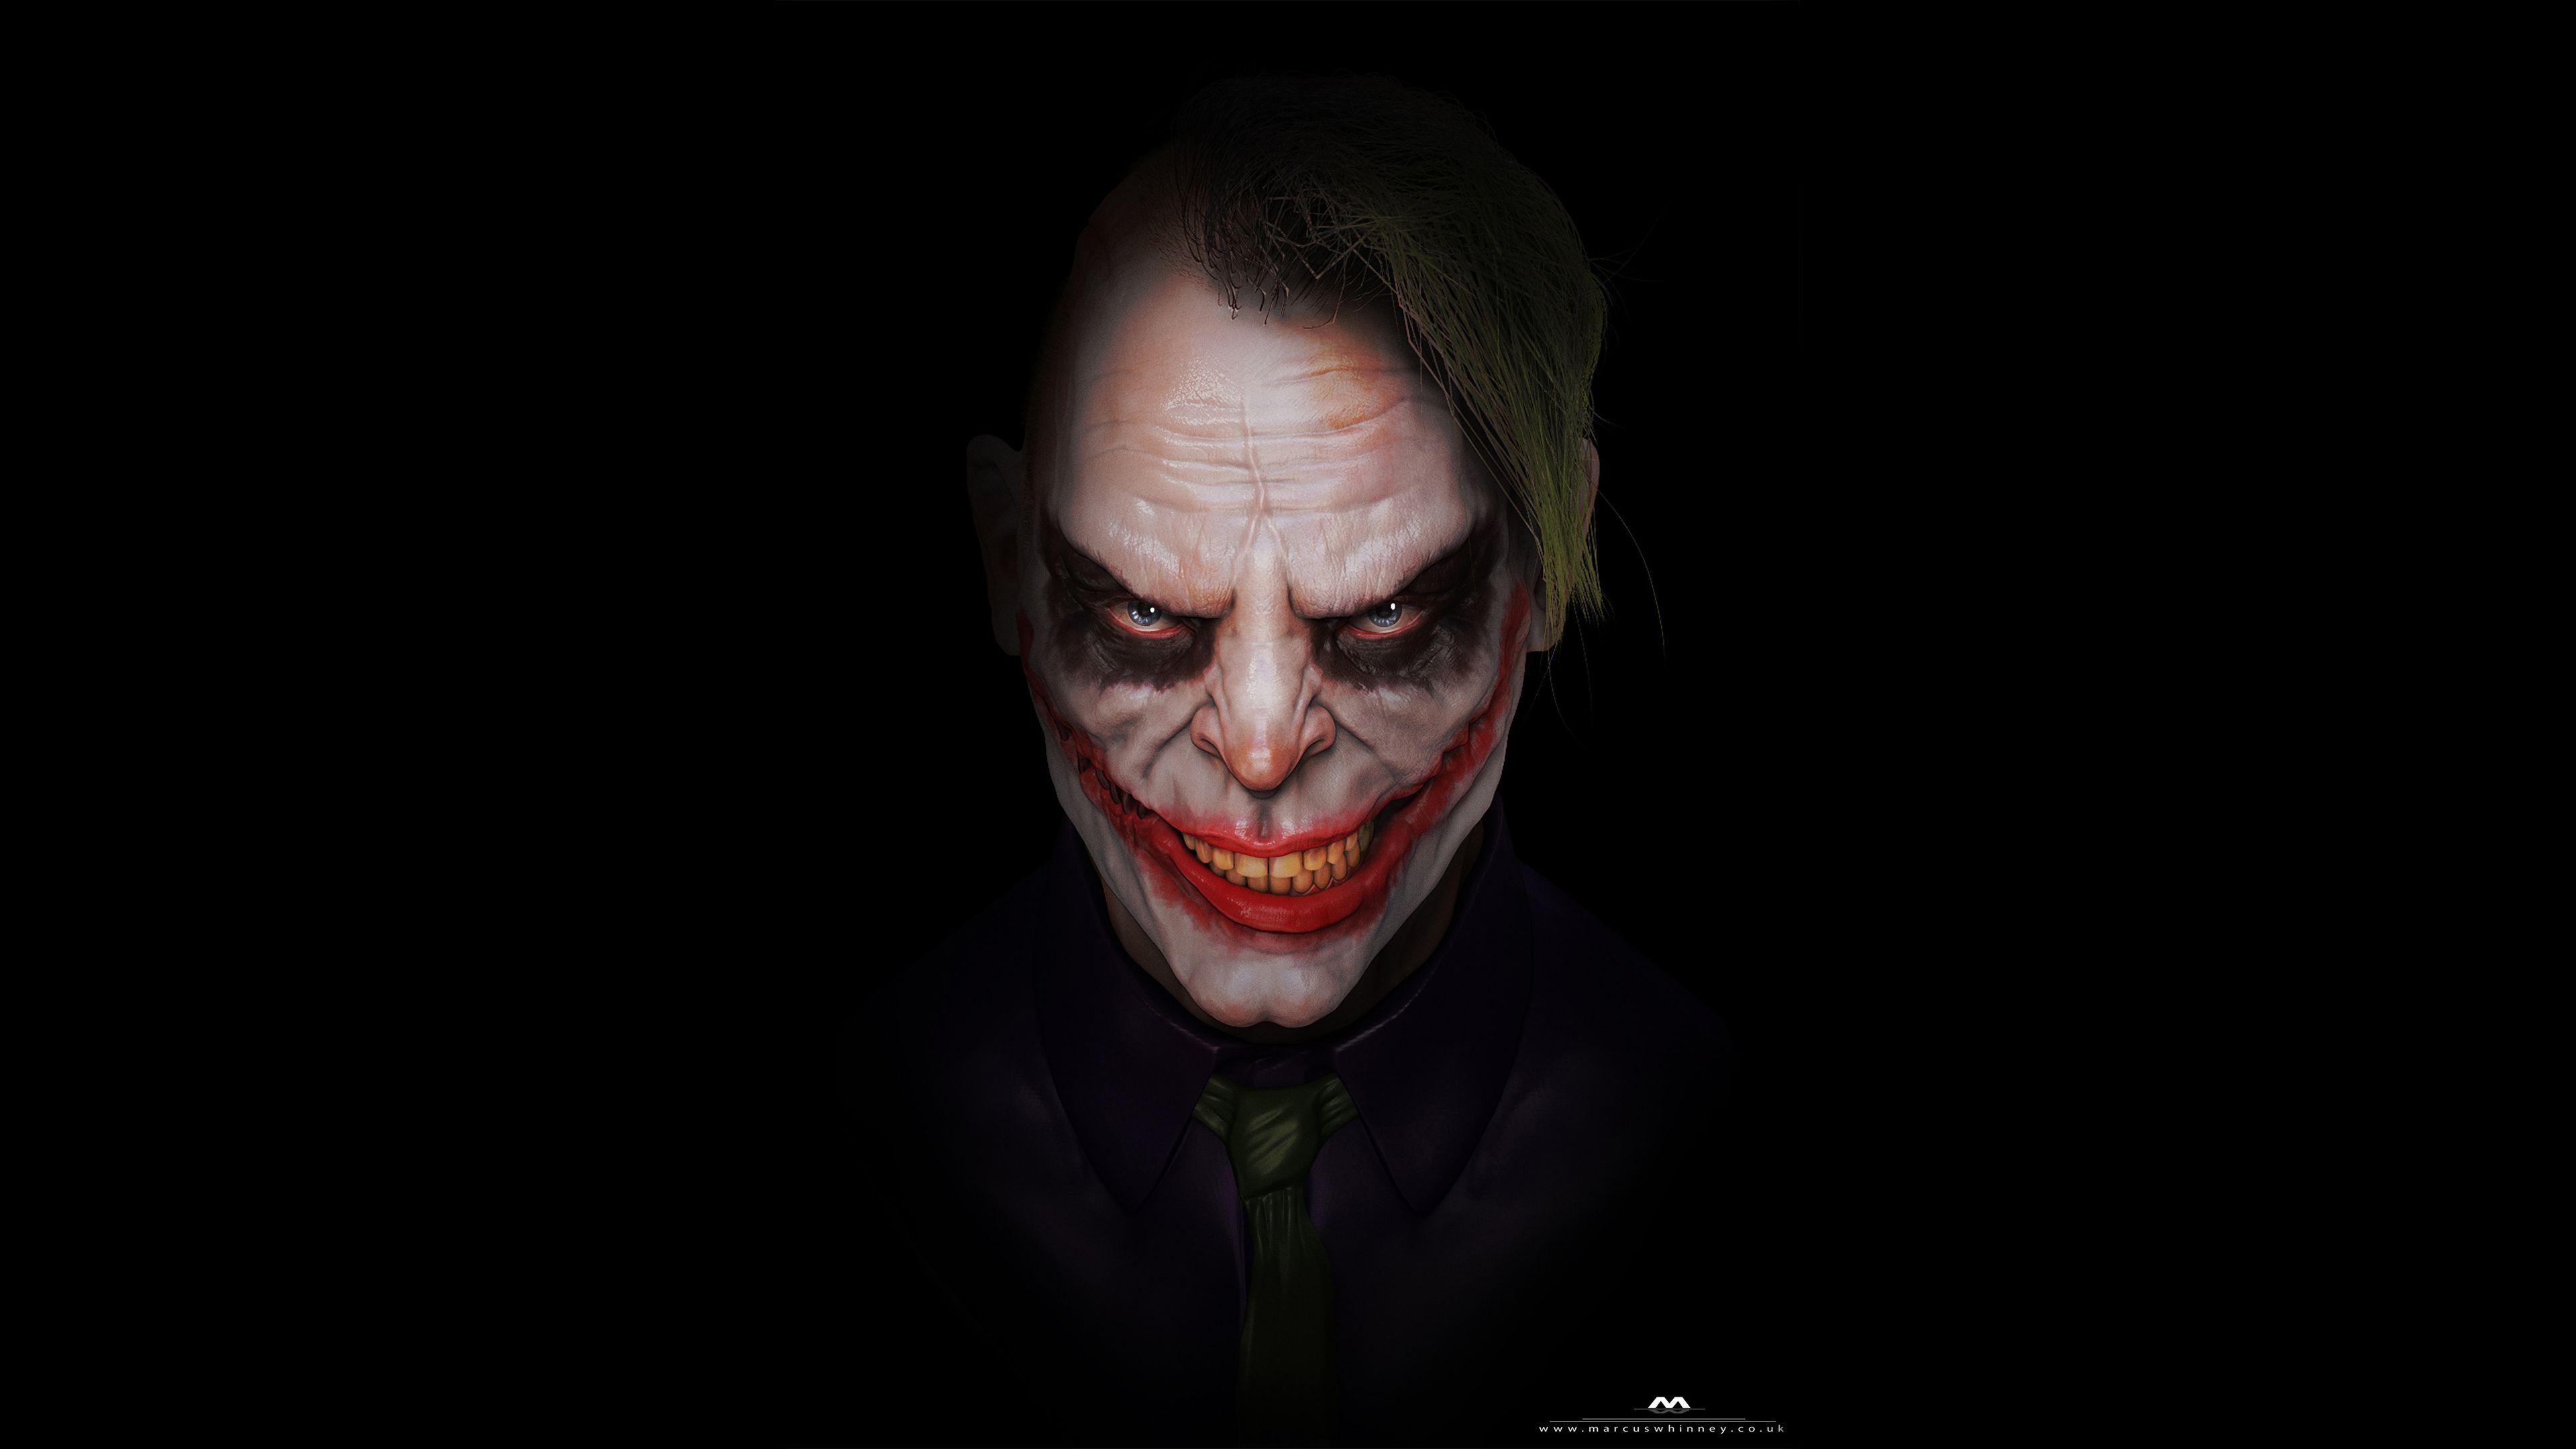 Joker 4k Ultra Hd Wallpaper Download Joker Pics 4k Wallpaper For Mobile Hd Wallpaper